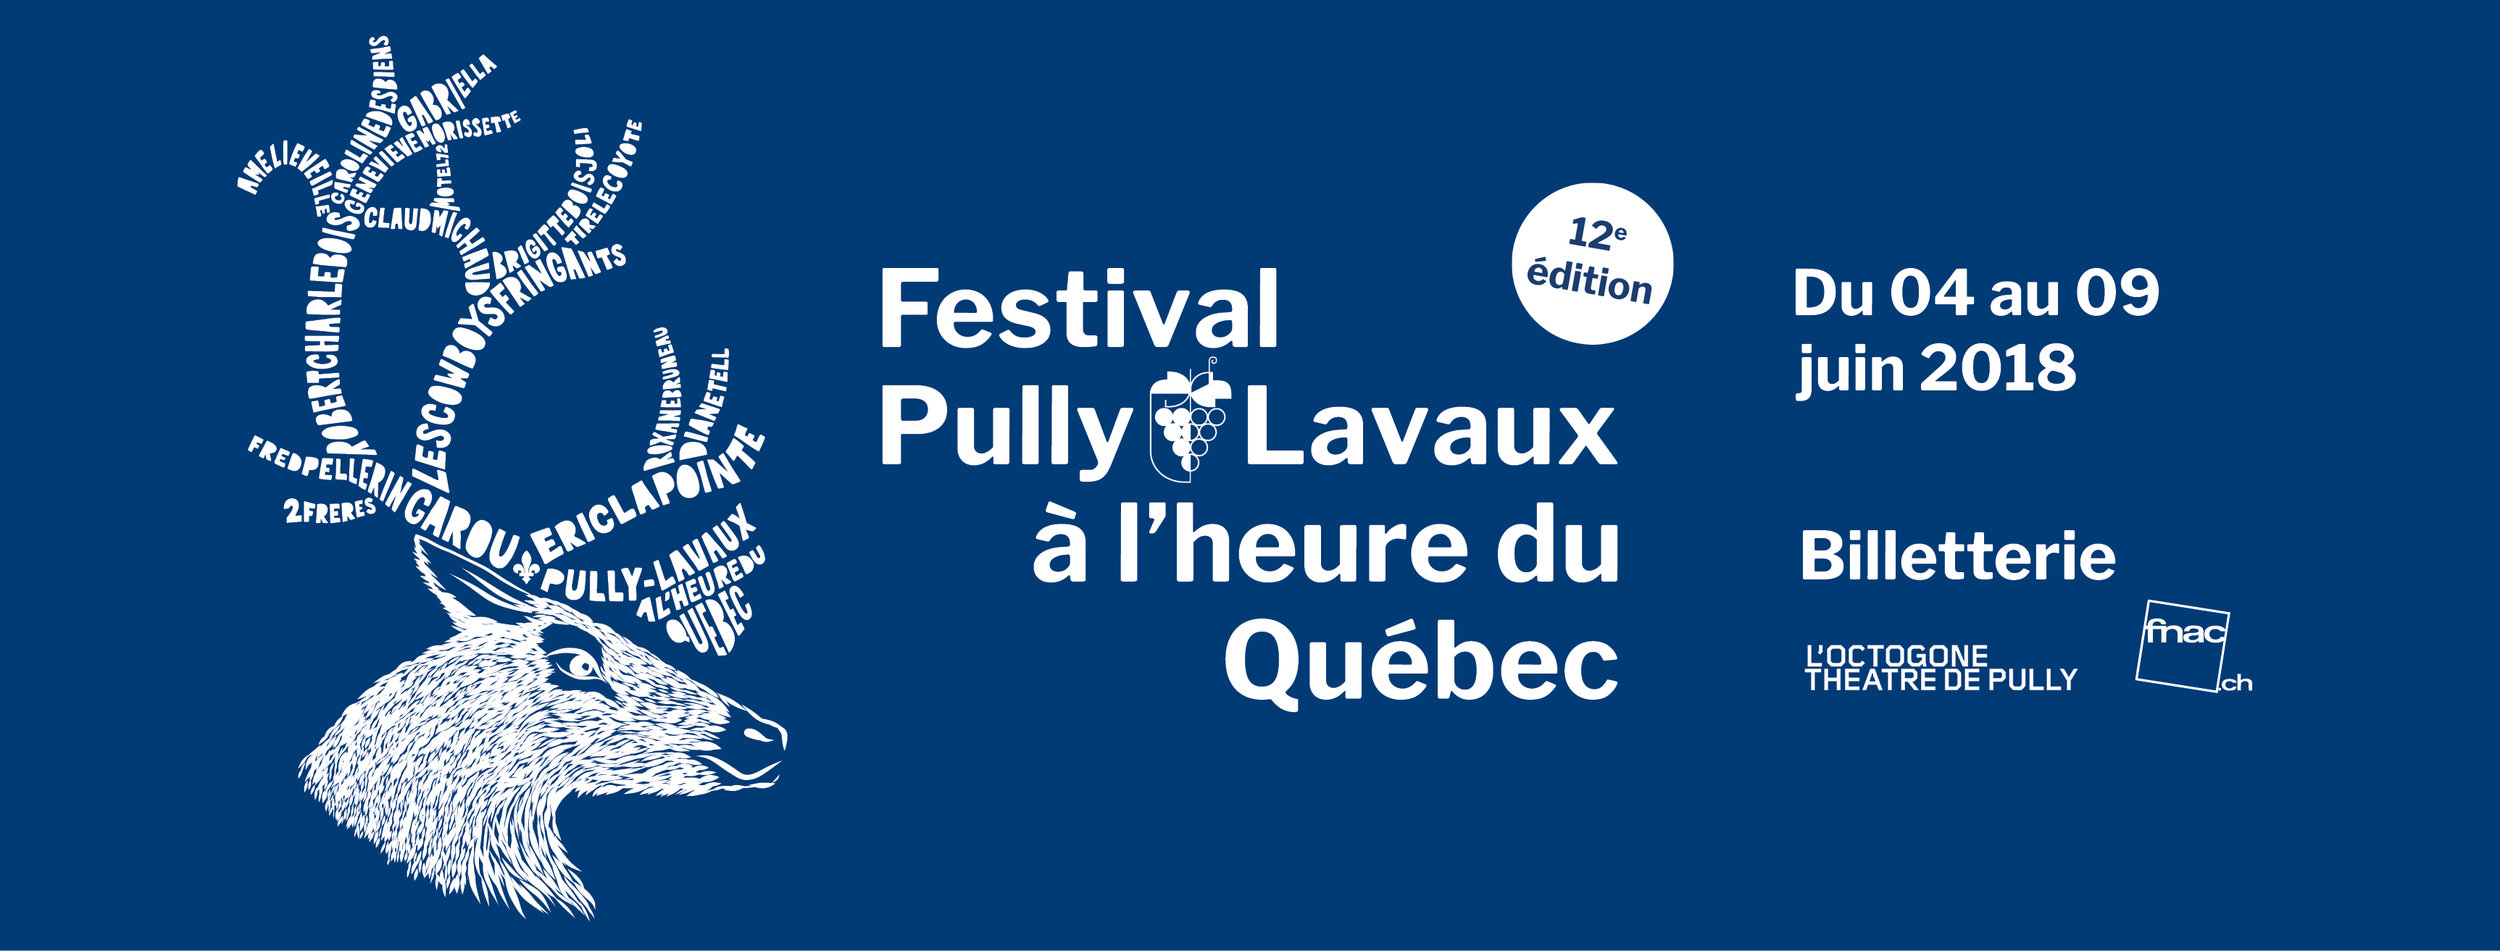 Mashka_Pully-Quebec_Facebook_coverpic.jpg